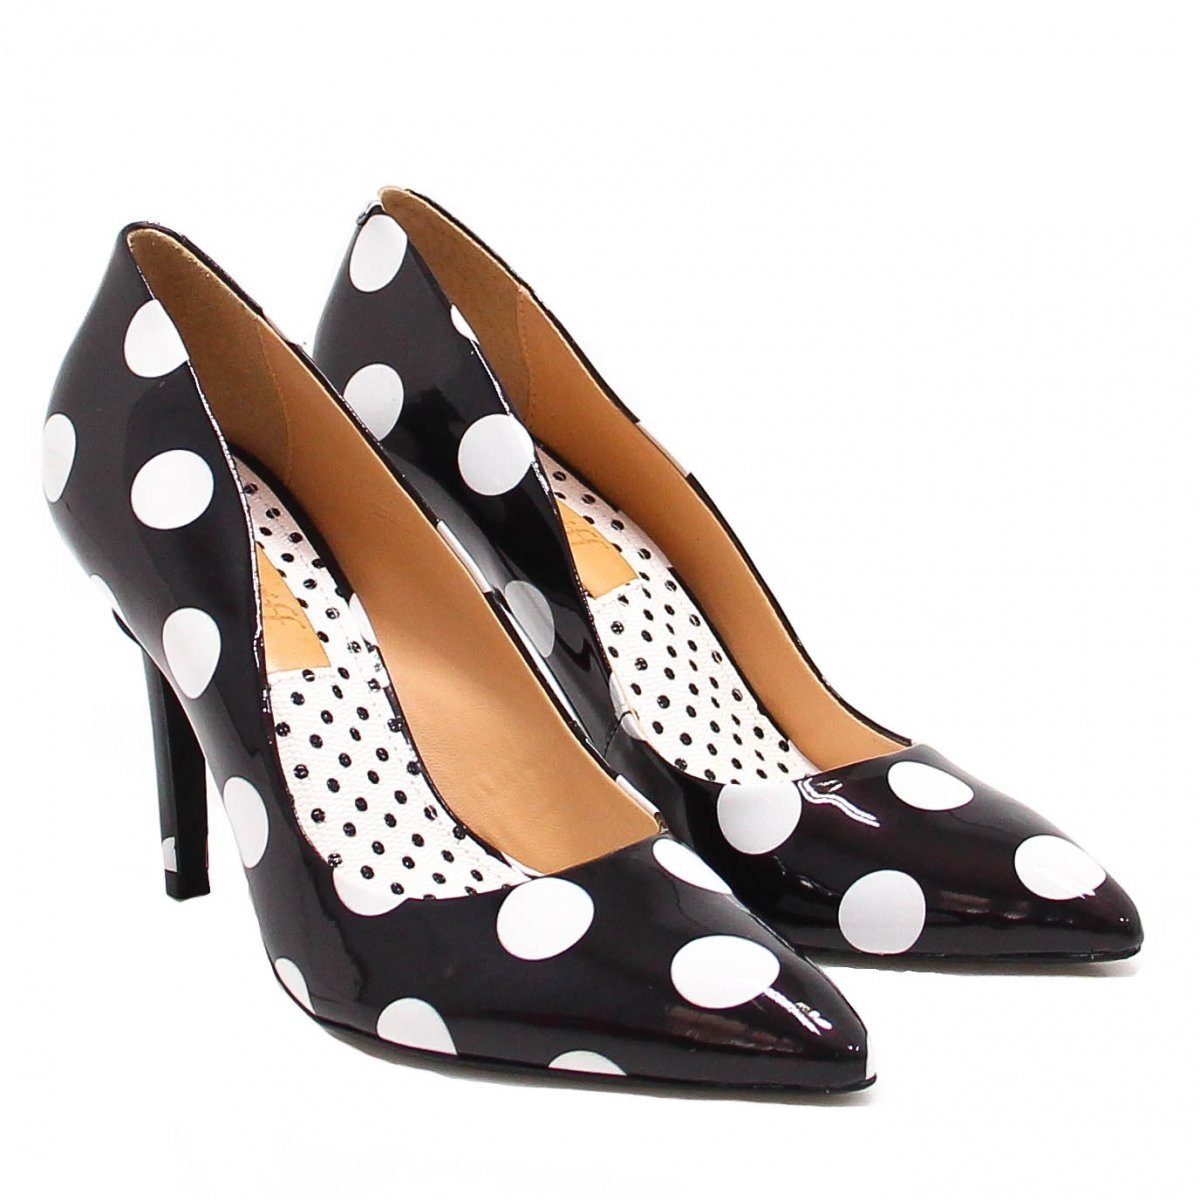 Shoes Zariff Sapato Sapato Zariff Preto Scarpin Verniz 7x0OWw